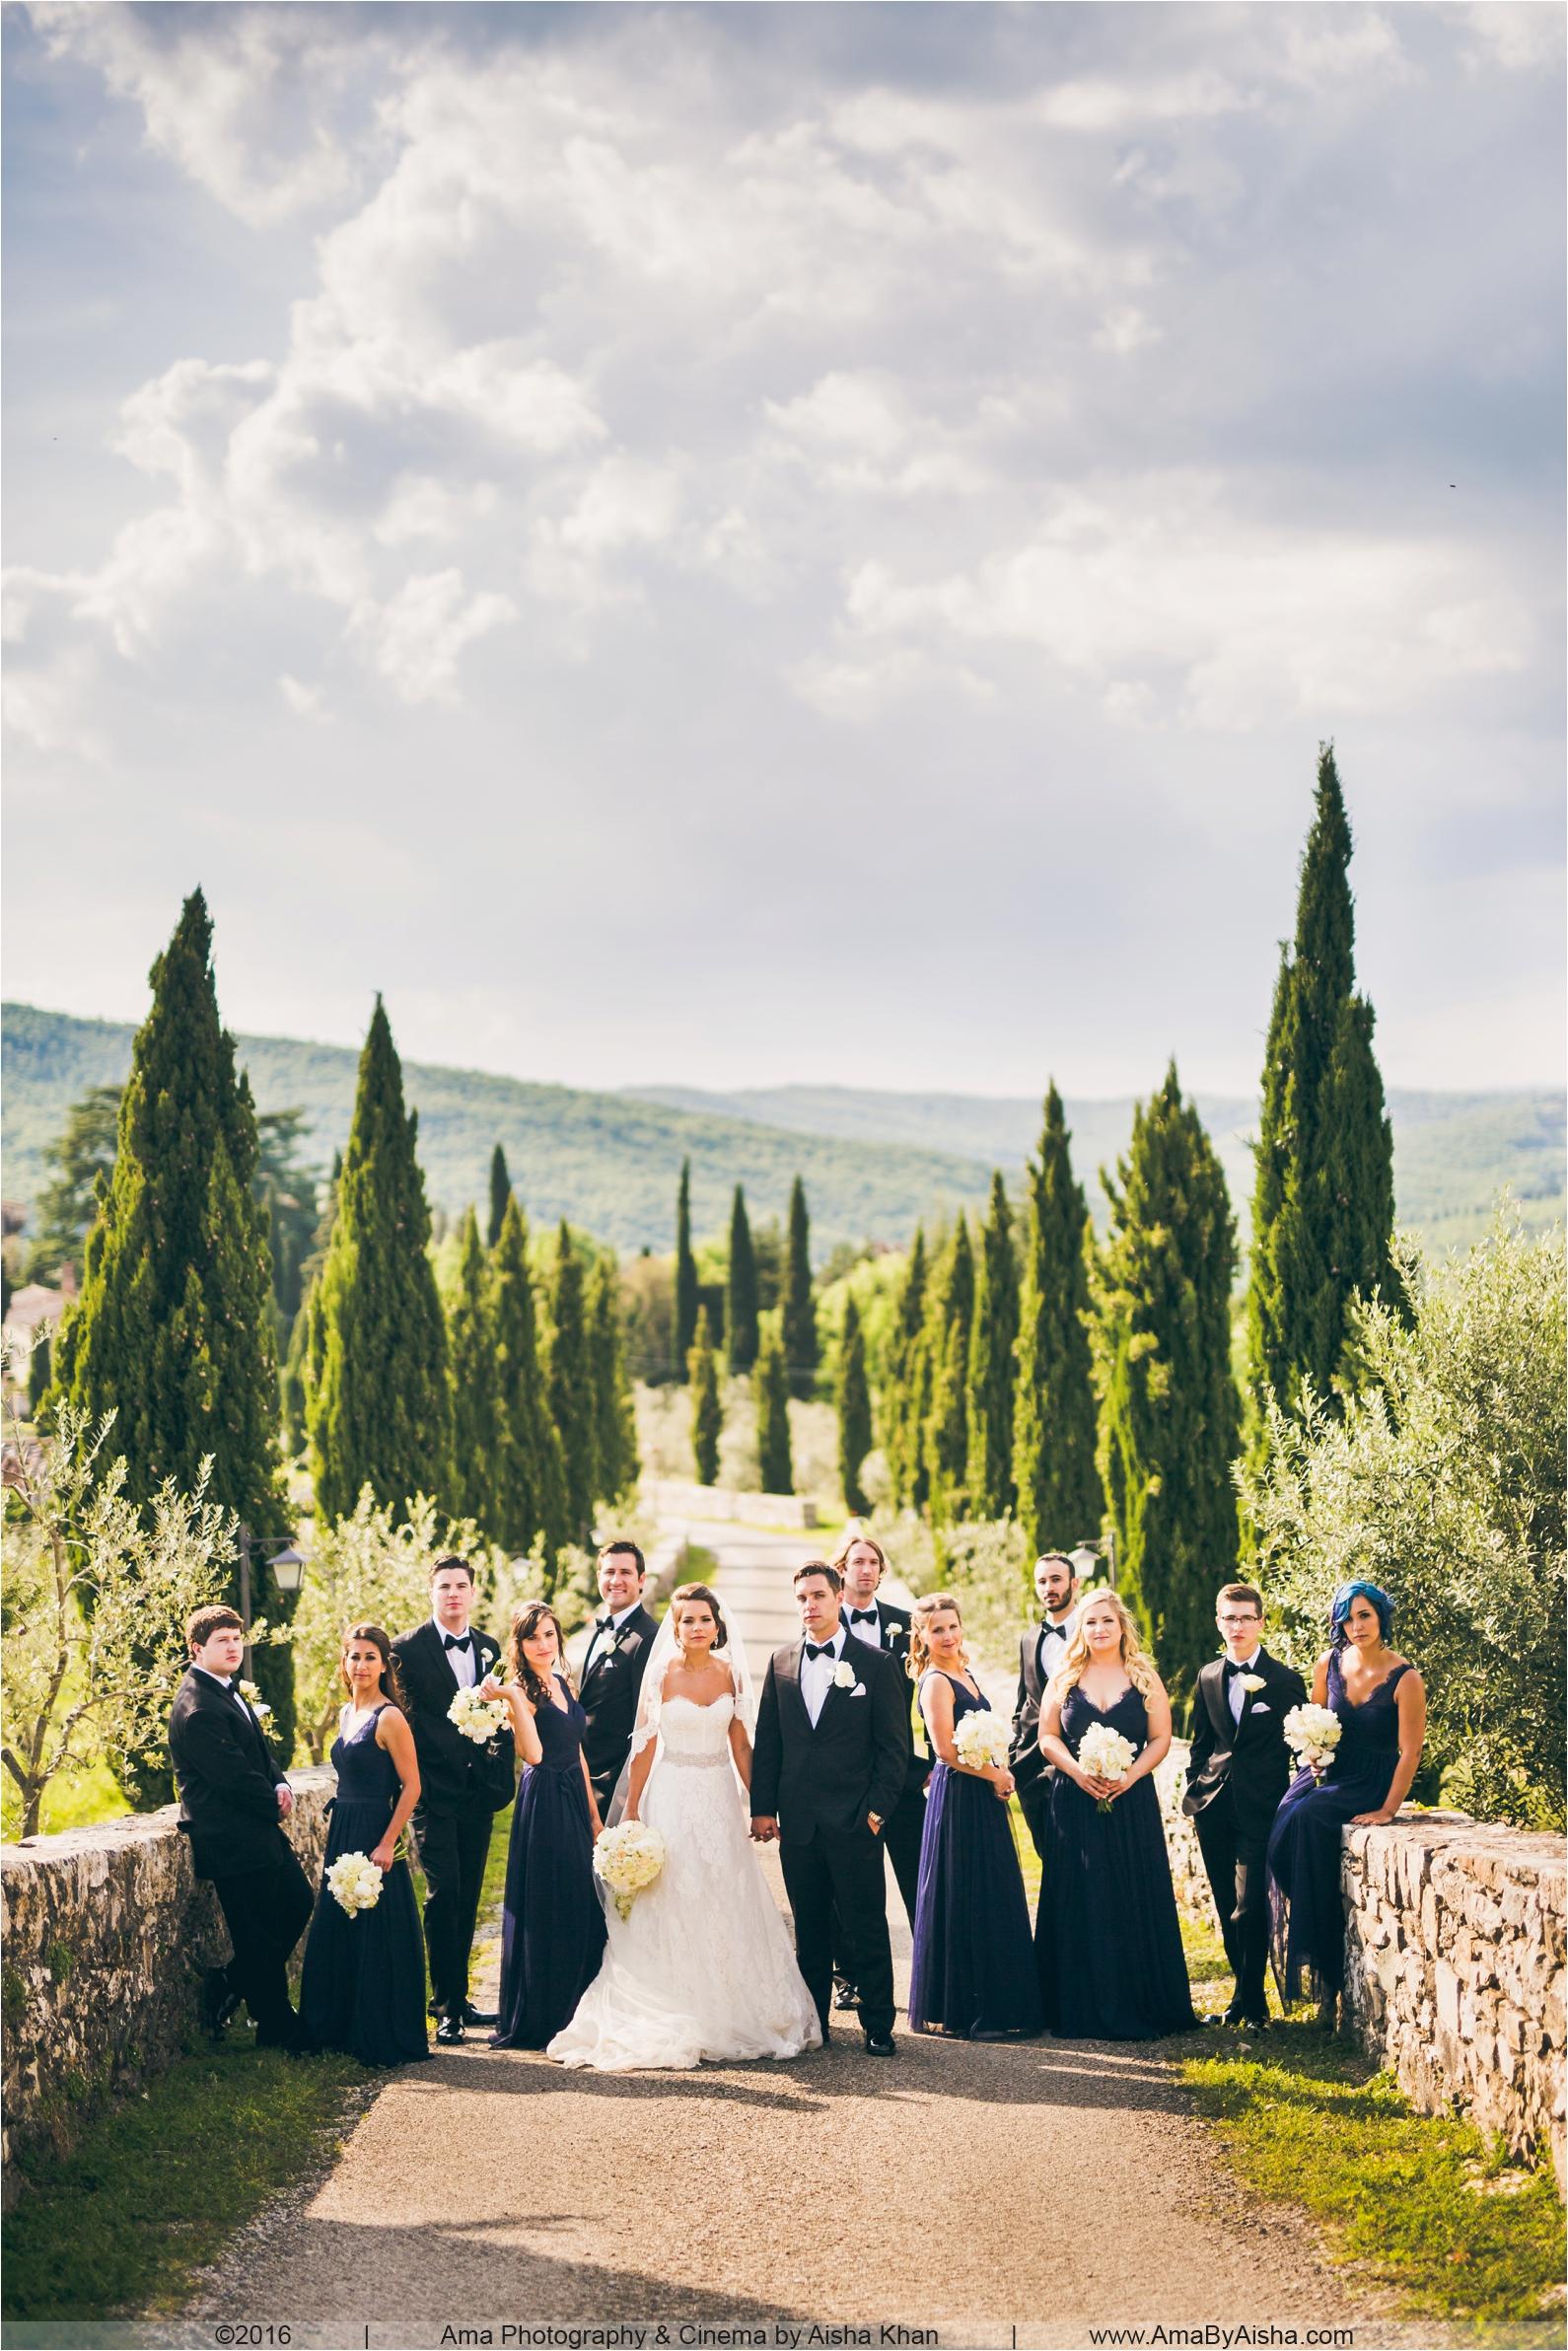 Destination wedding photography photographer